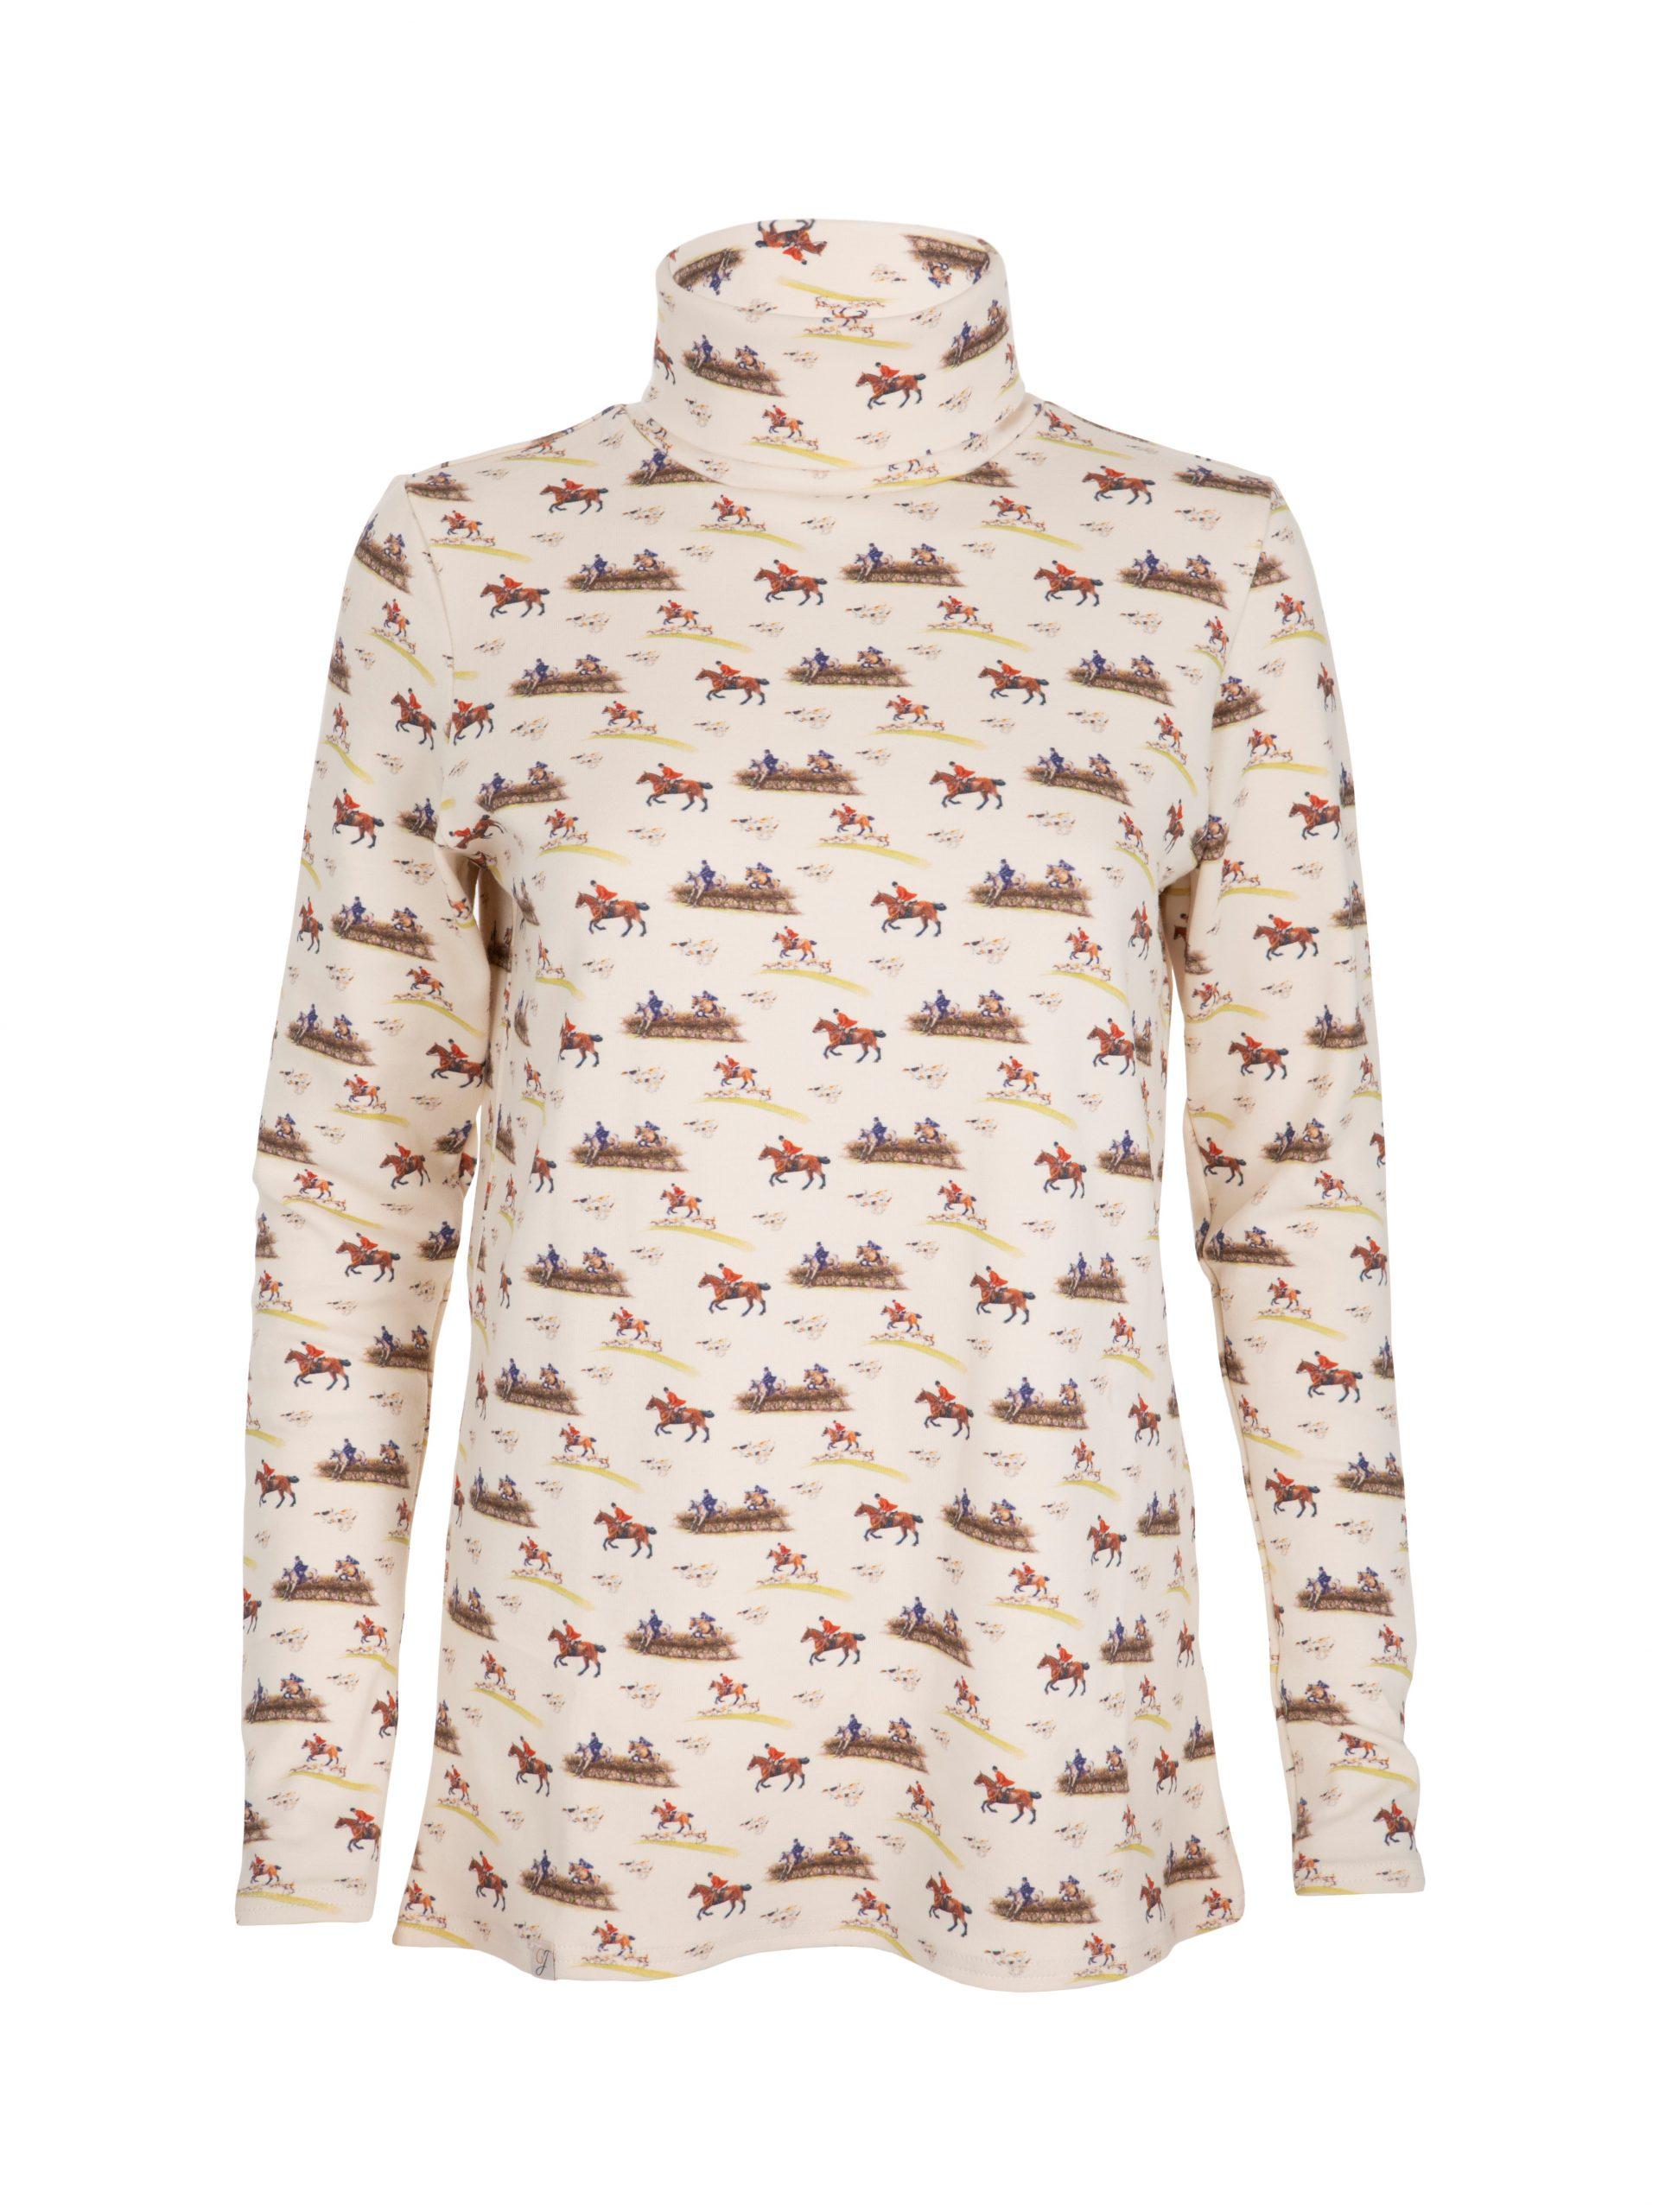 hunting scene clothing